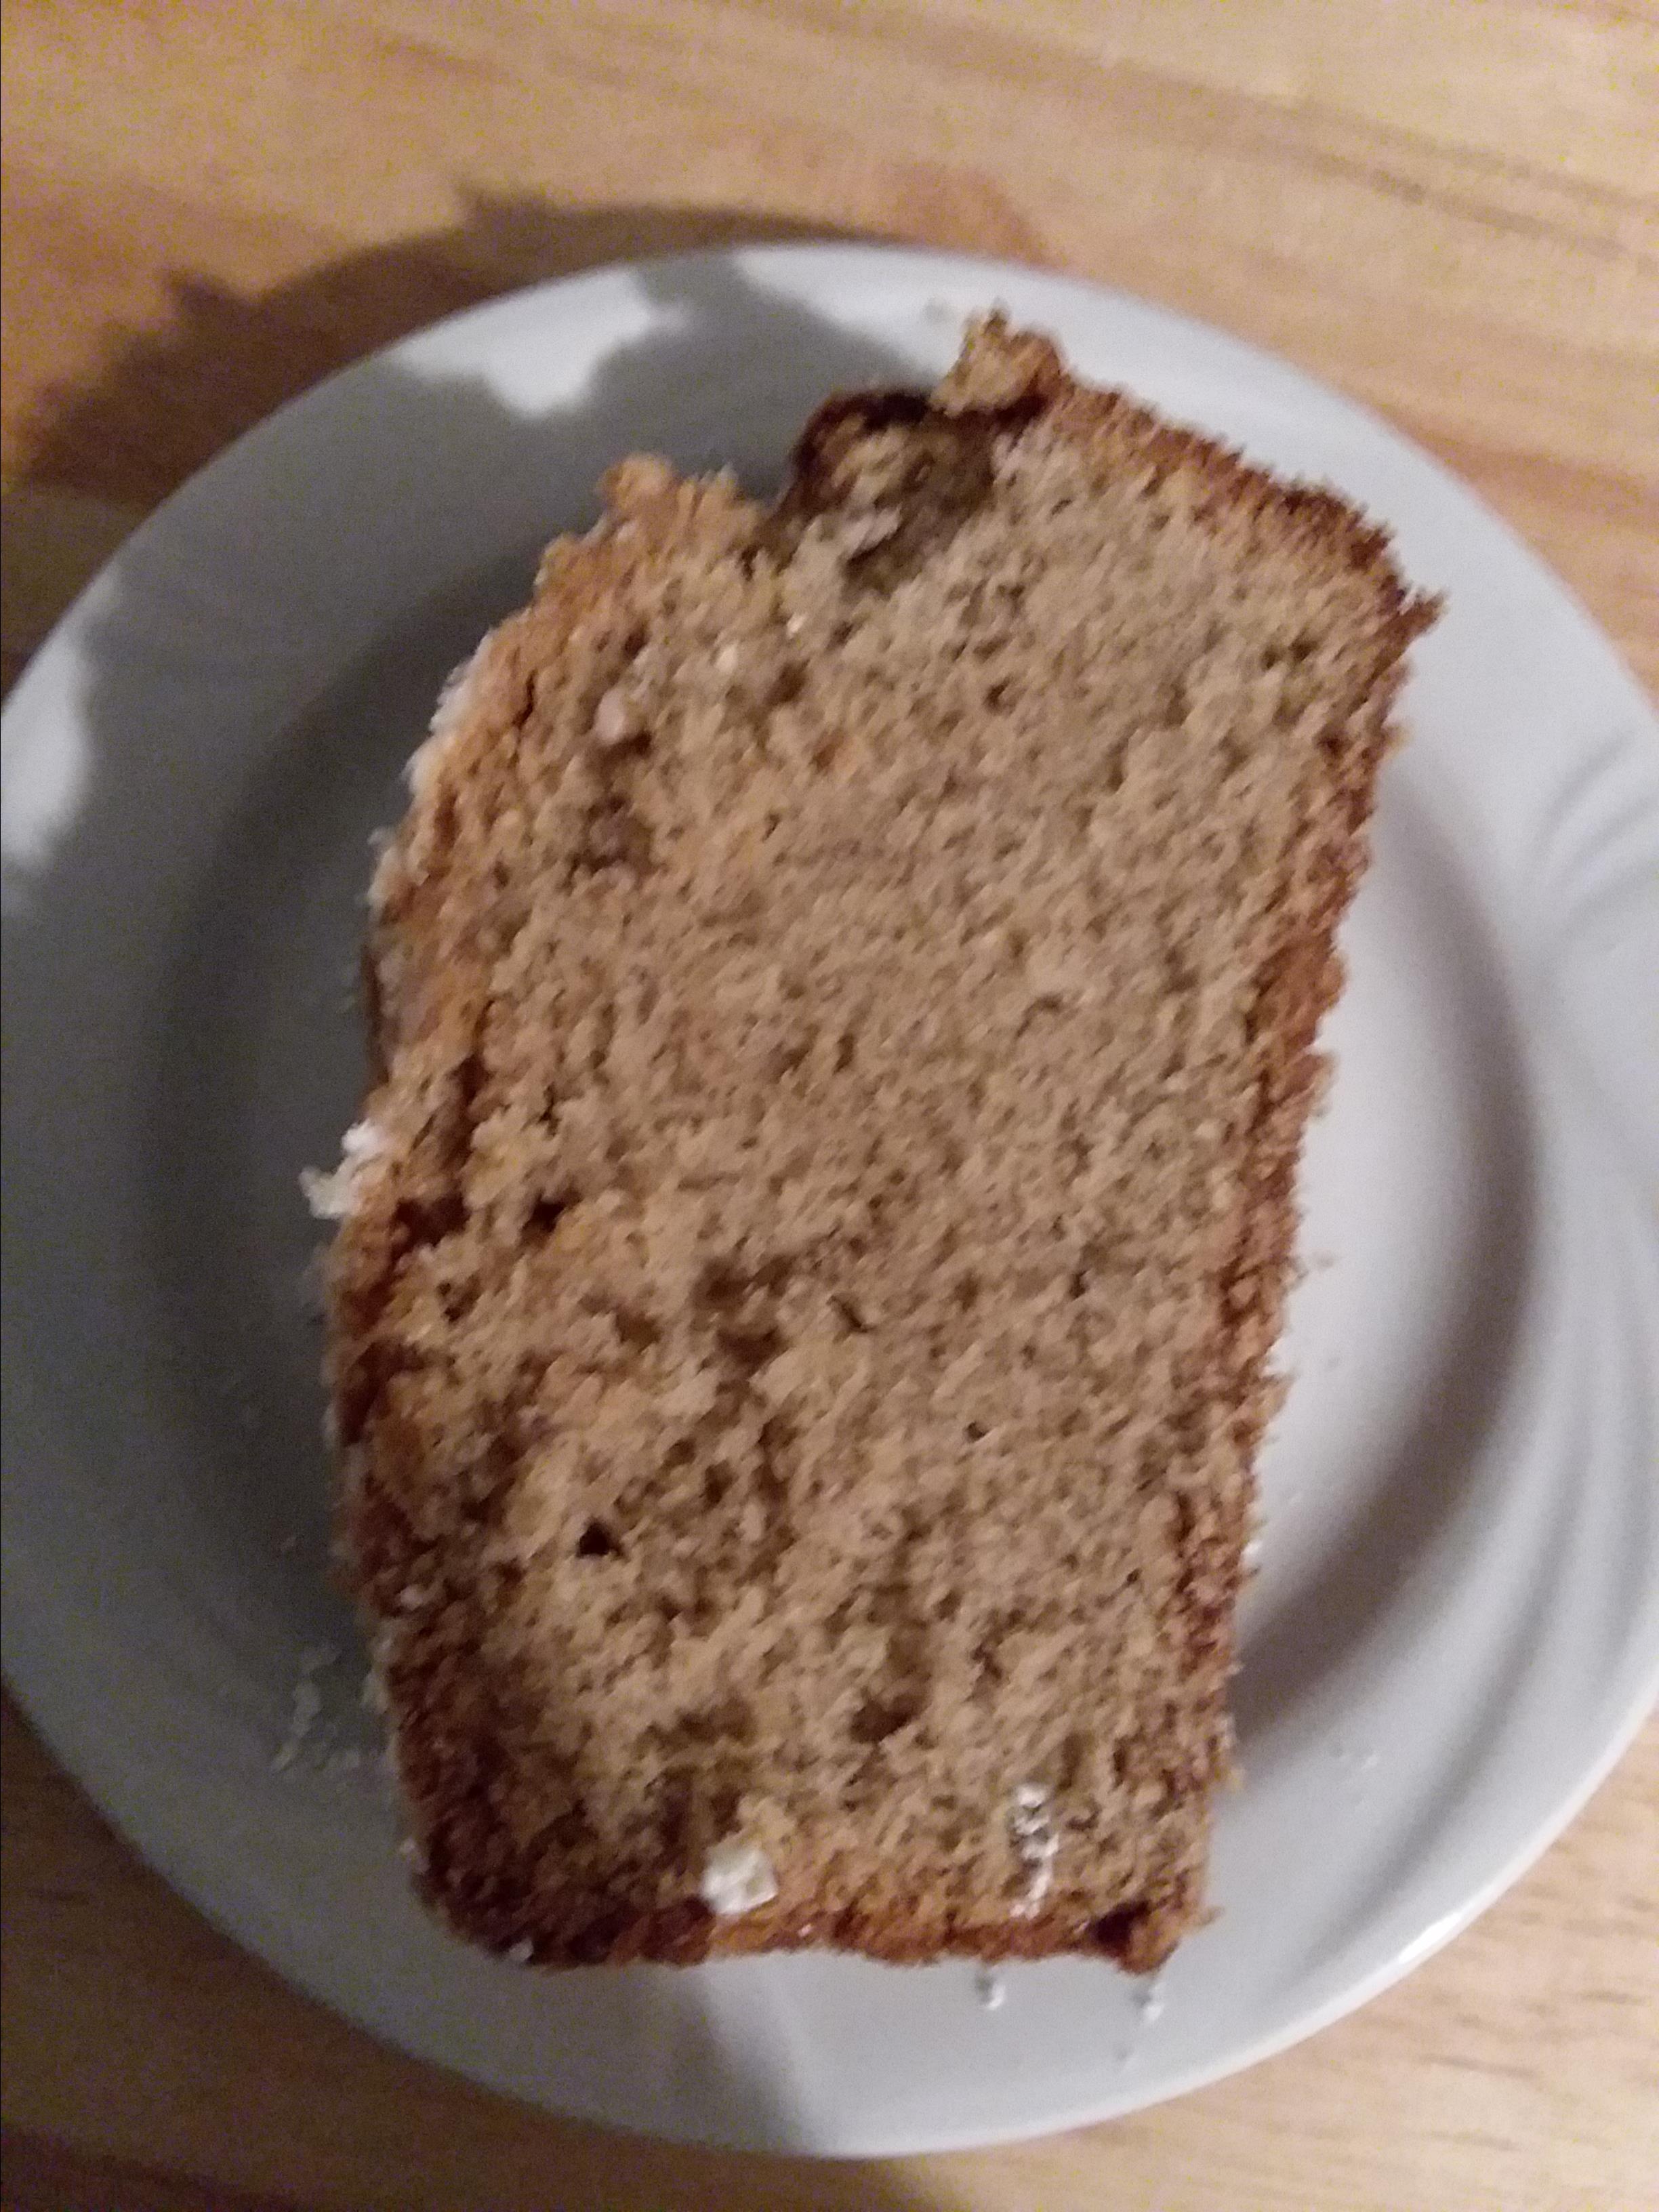 Amish Friendship Bread I bossysaucy